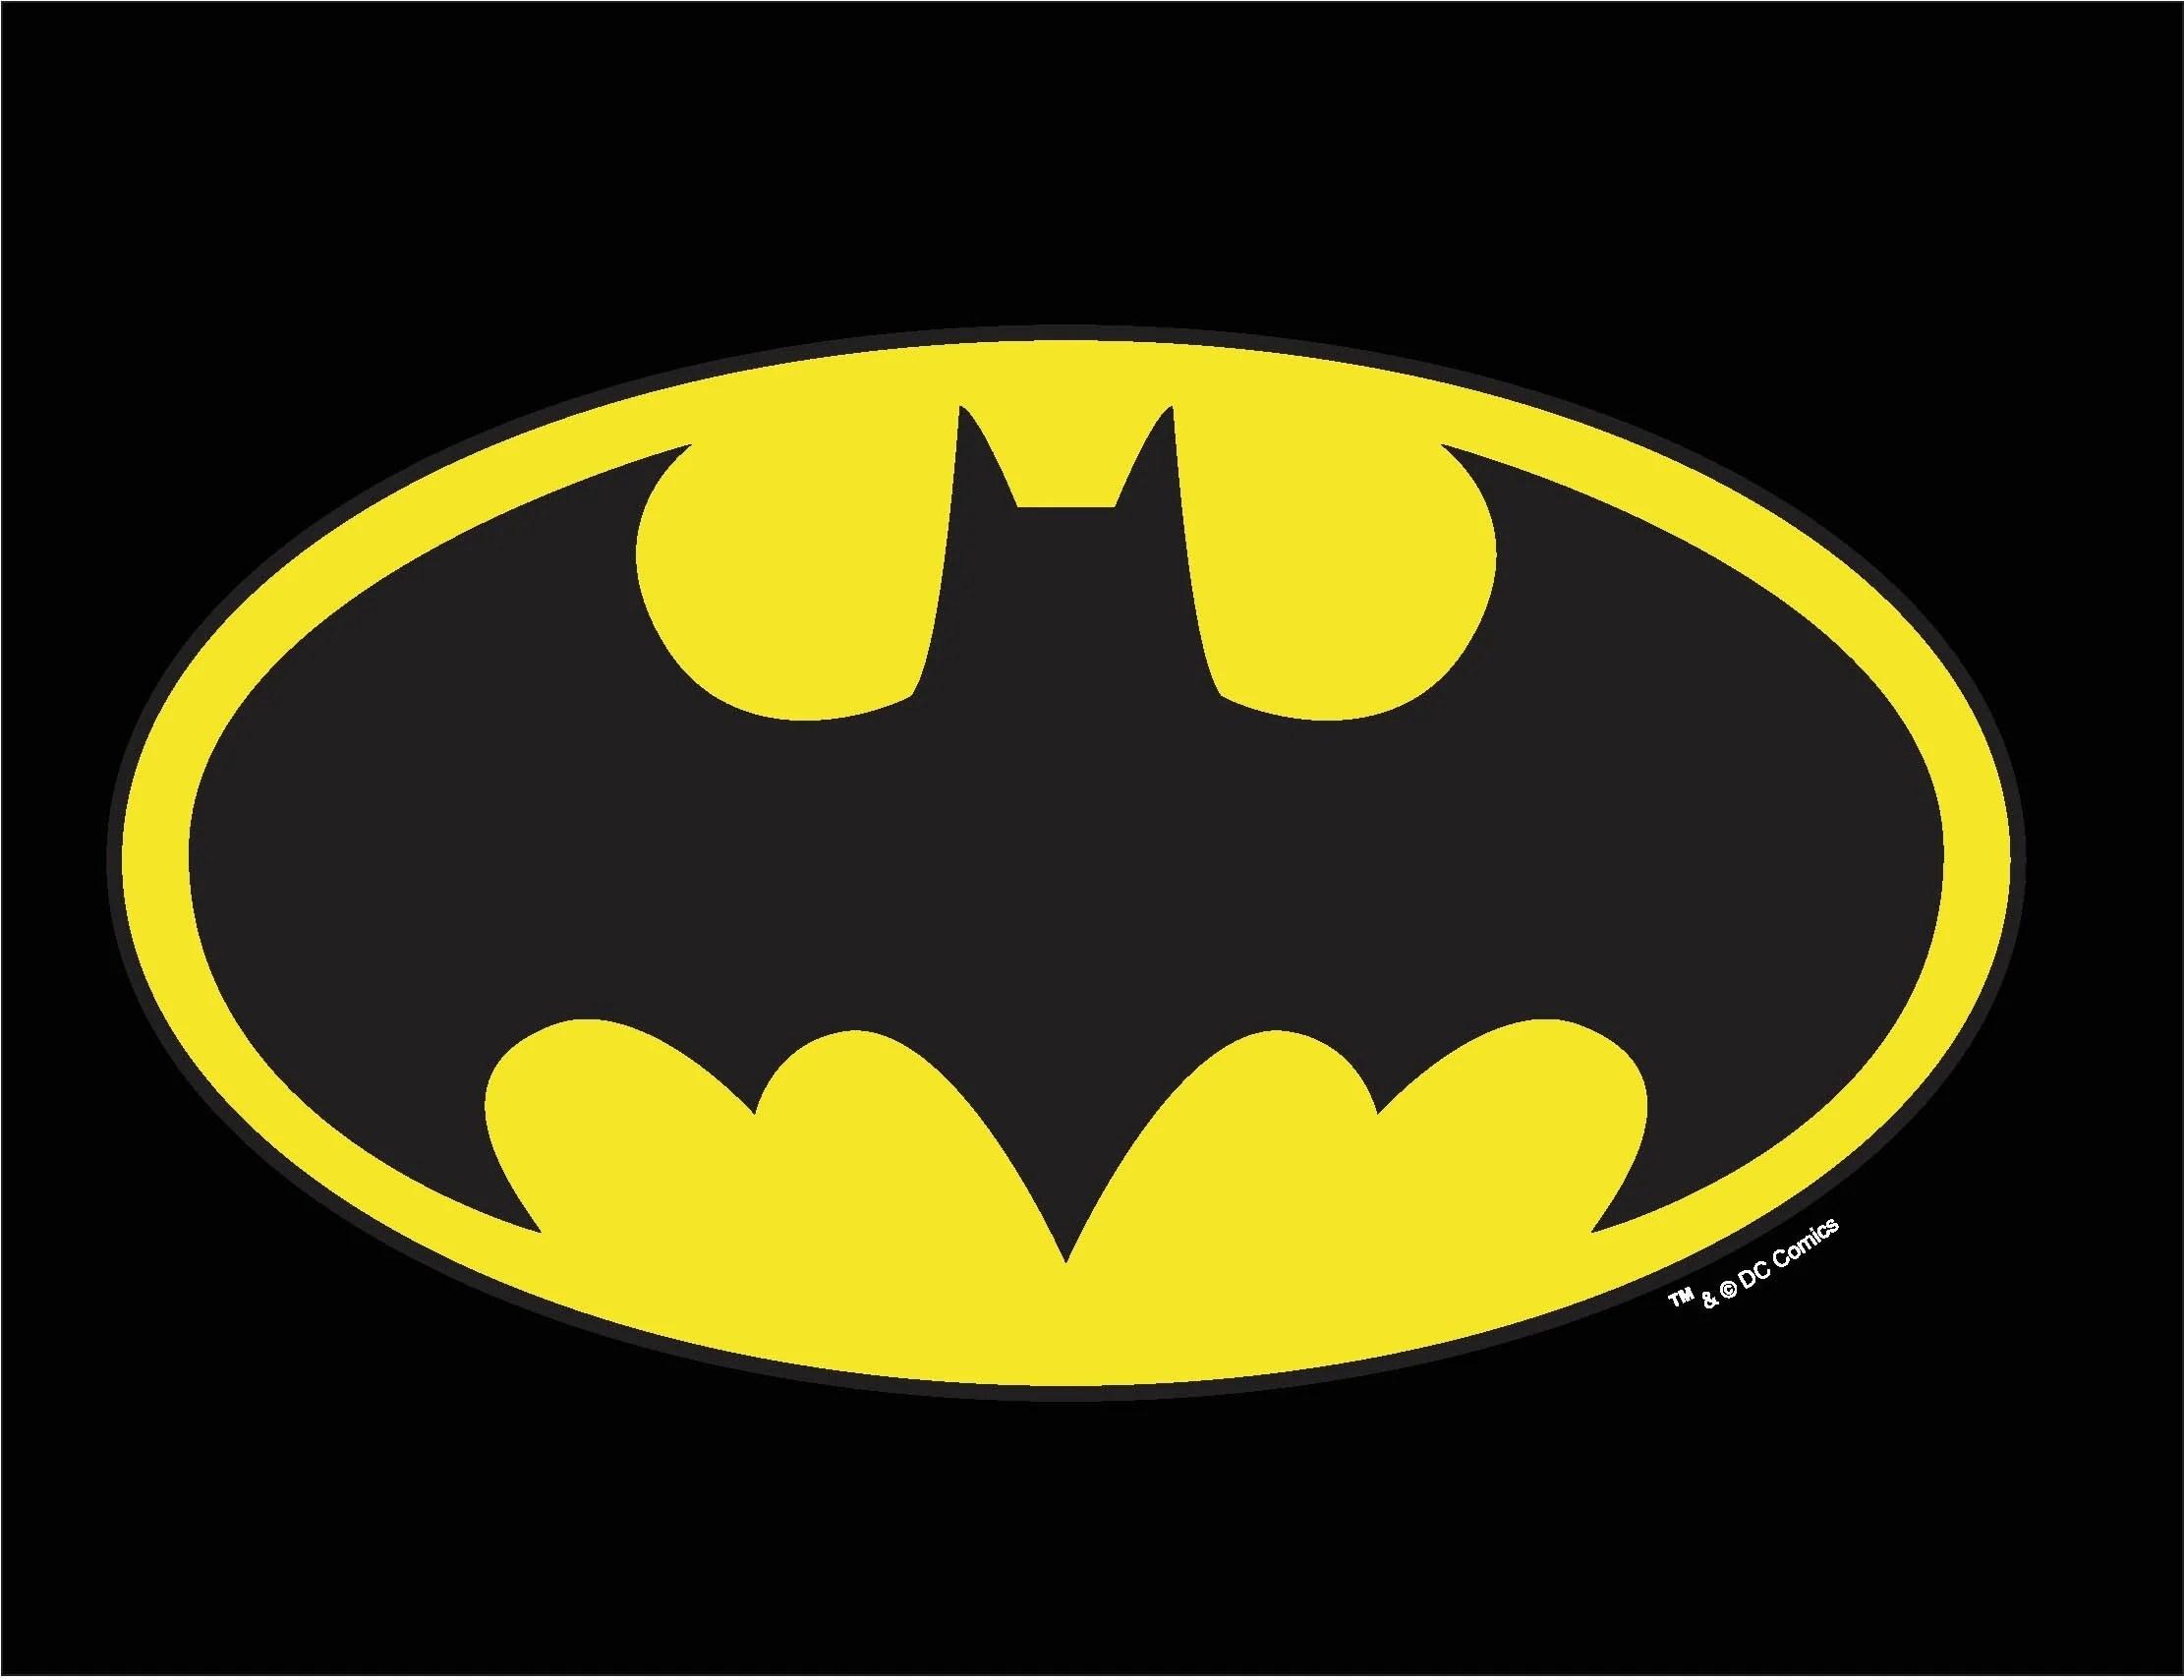 Cute Kiwi Wallpaper Batgirl Logo Printable